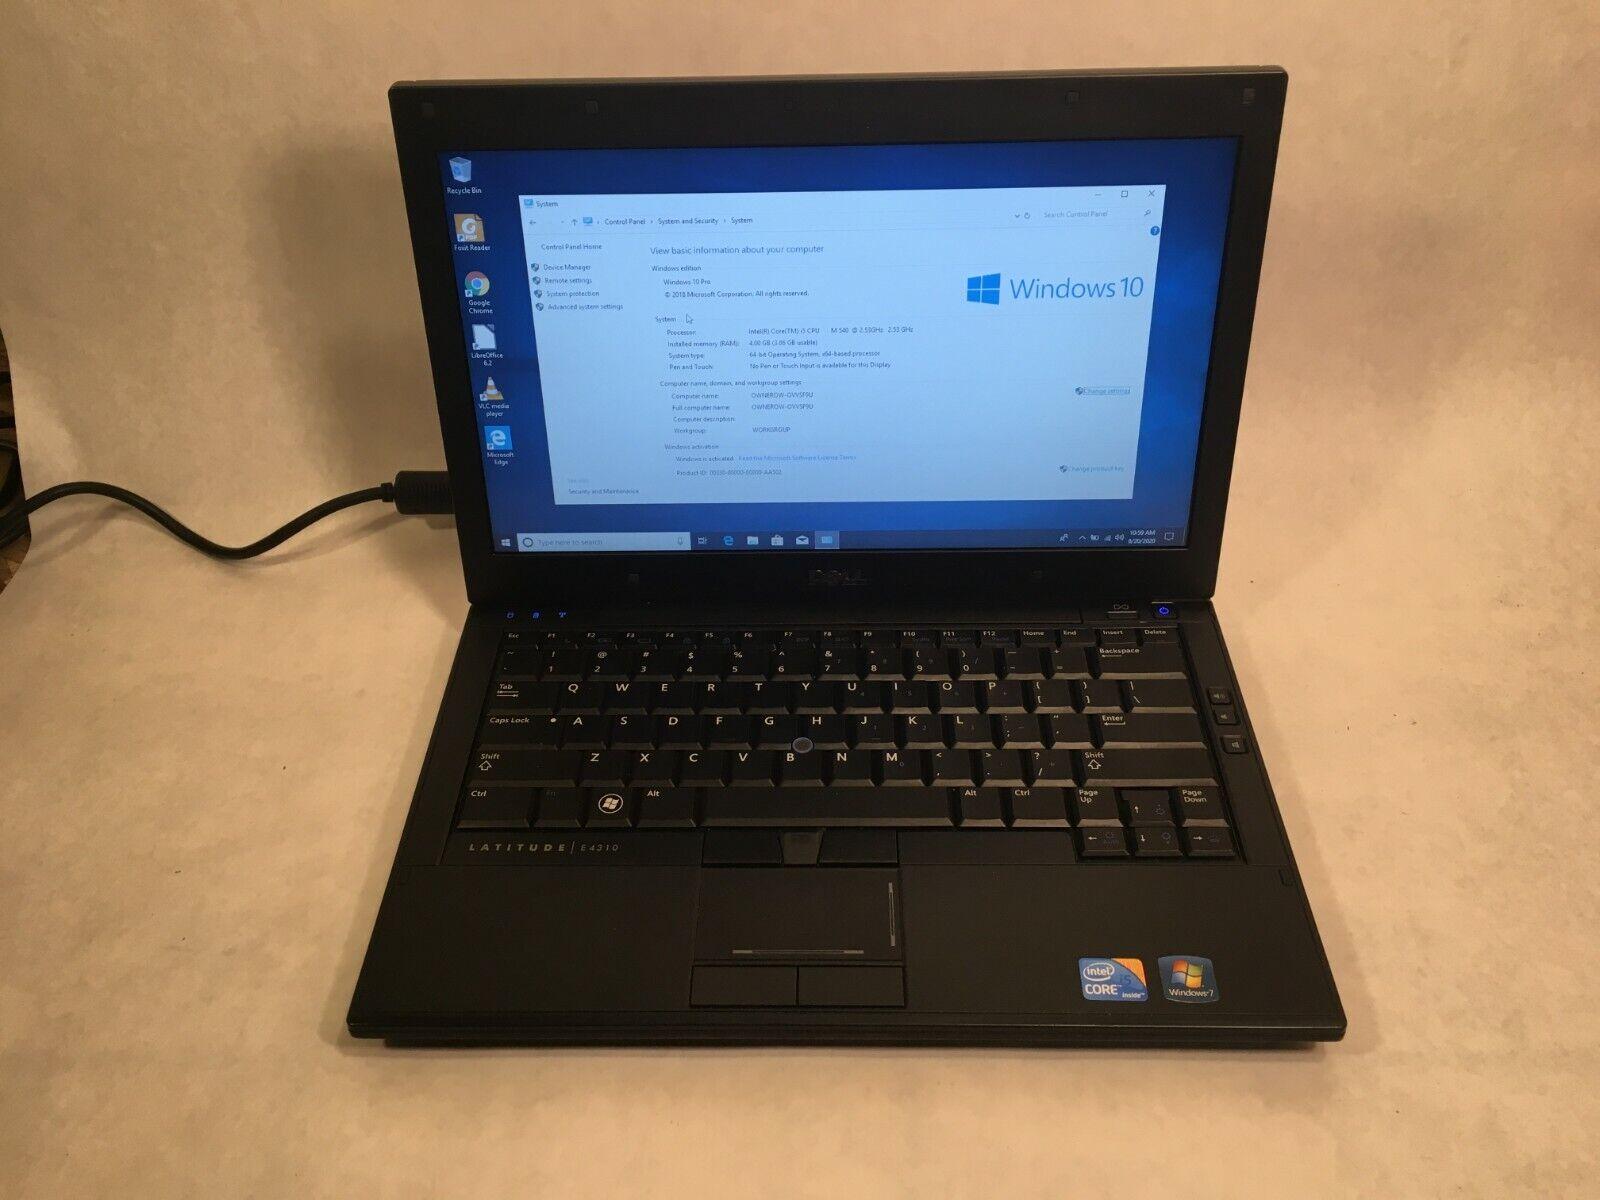 "Dell Latitude E6400 14"" Laptop Intel - FAST - 4GB RAM 160GB HDD Windows 7"